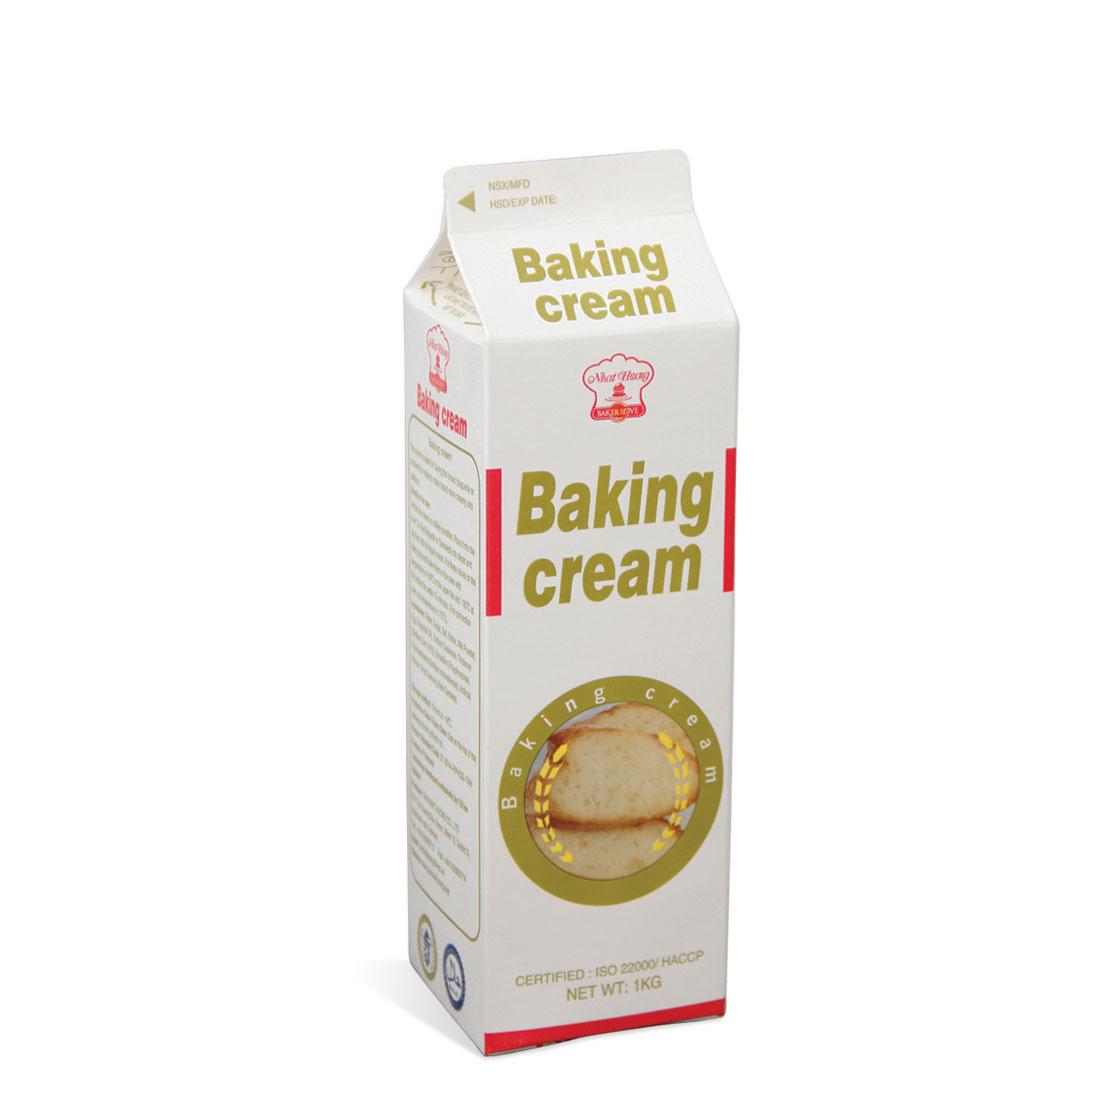 Baking Cream